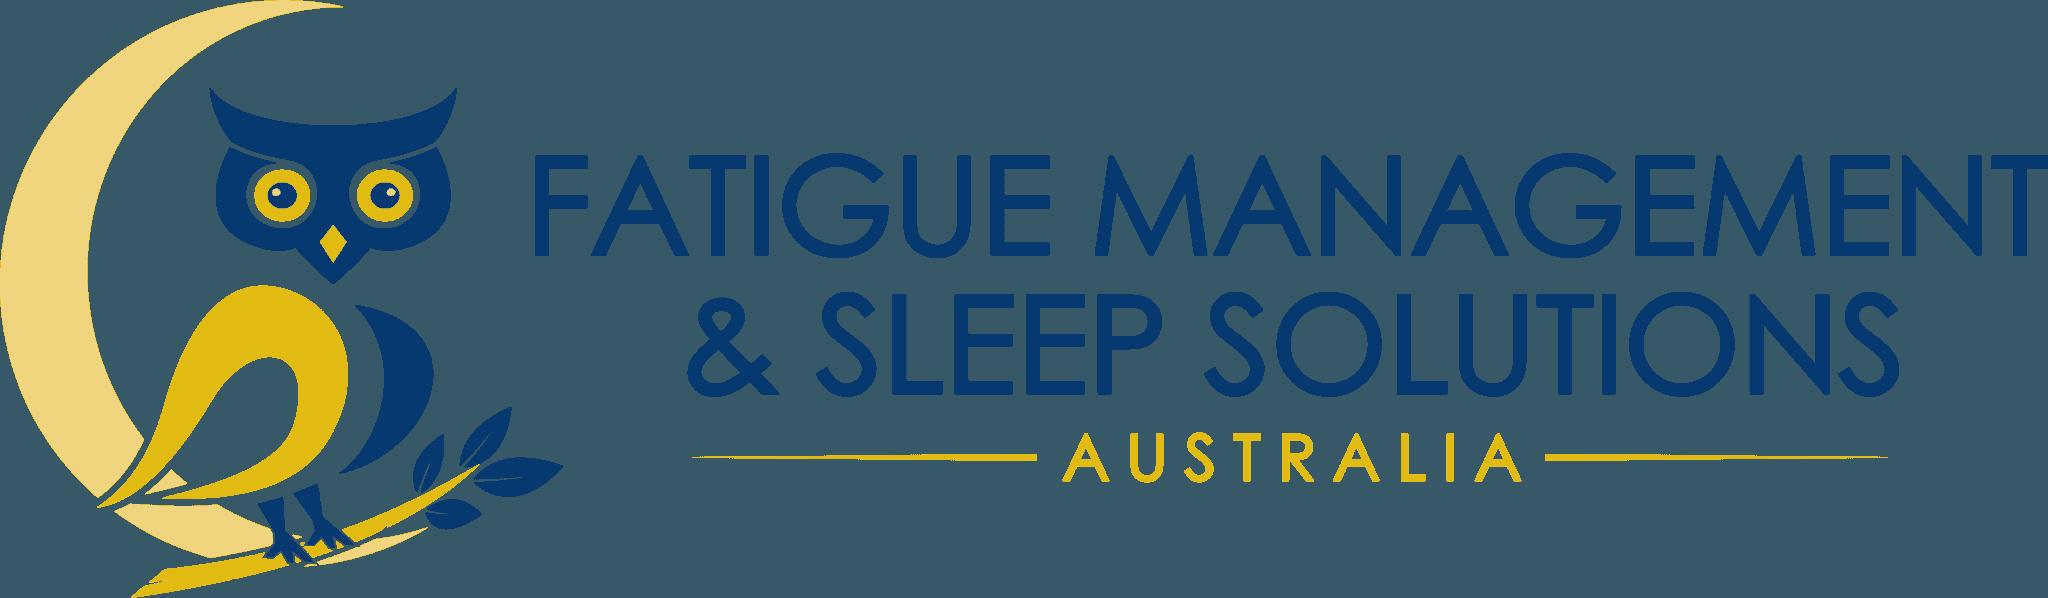 Fatigue Management & Sleep Solutions Australia